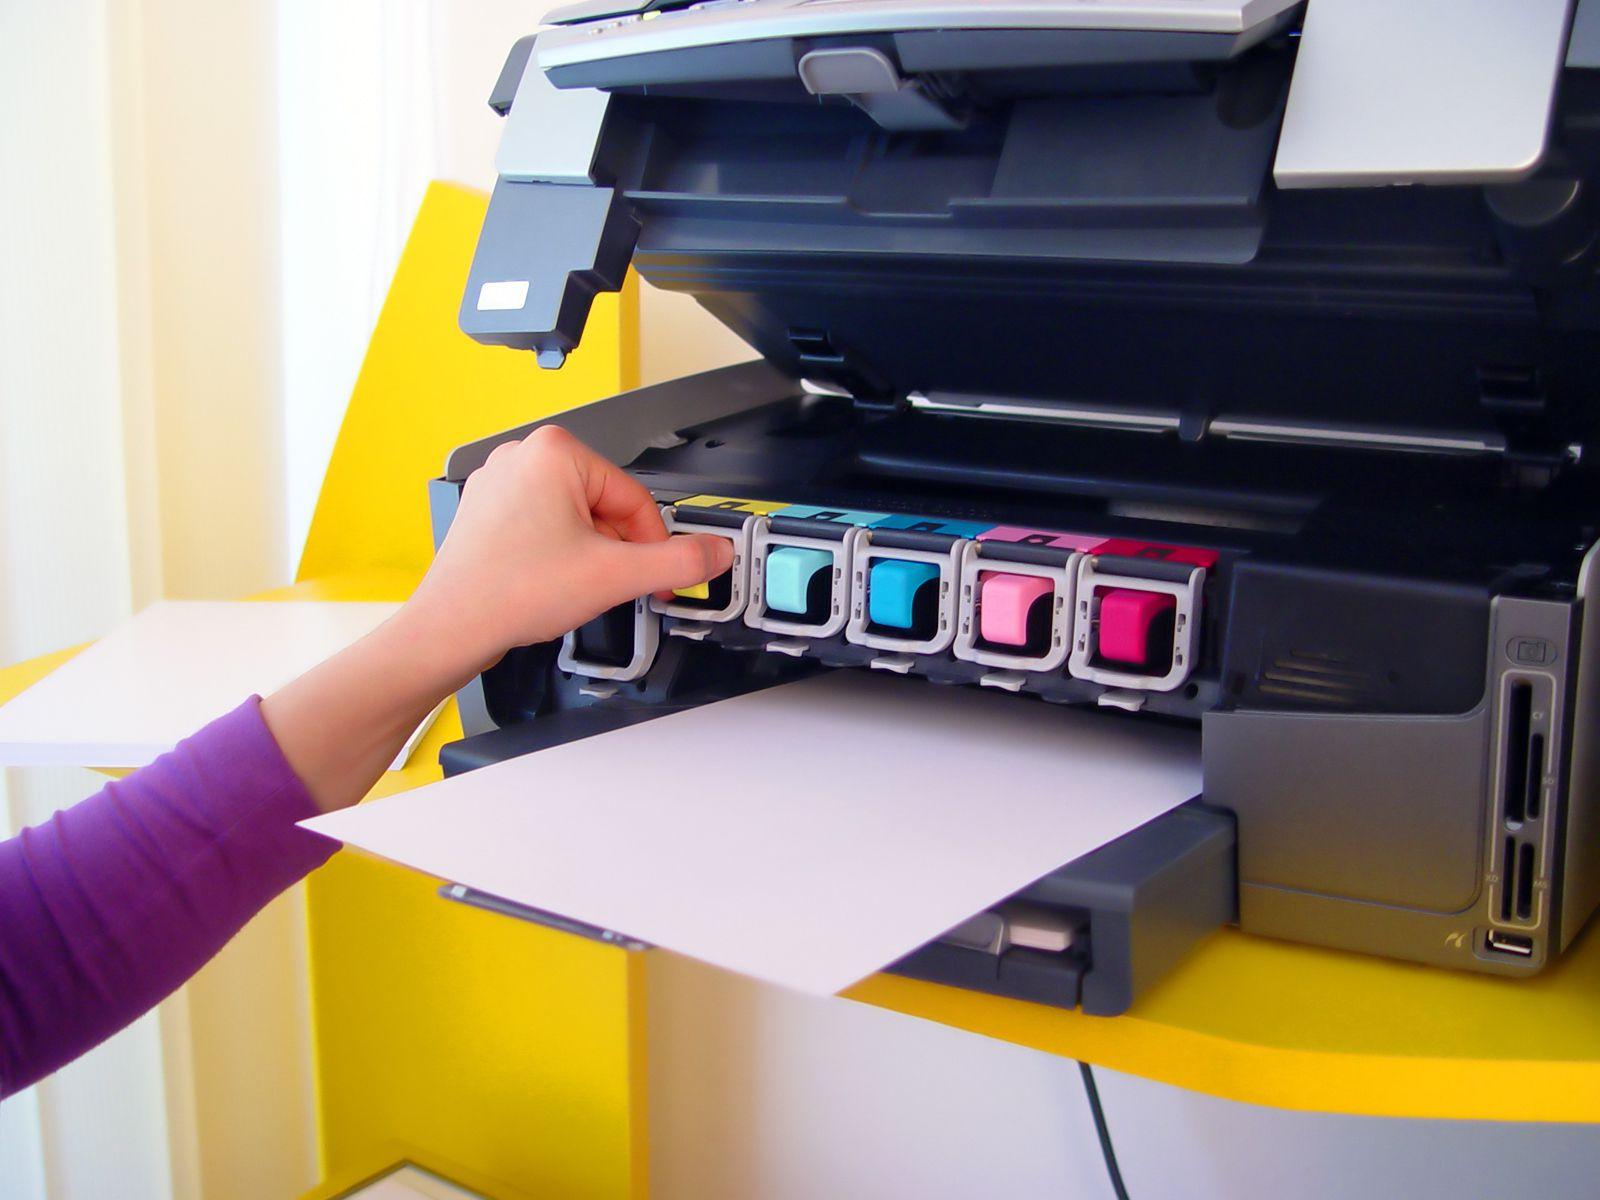 New Driver Brother Printer Wont Print